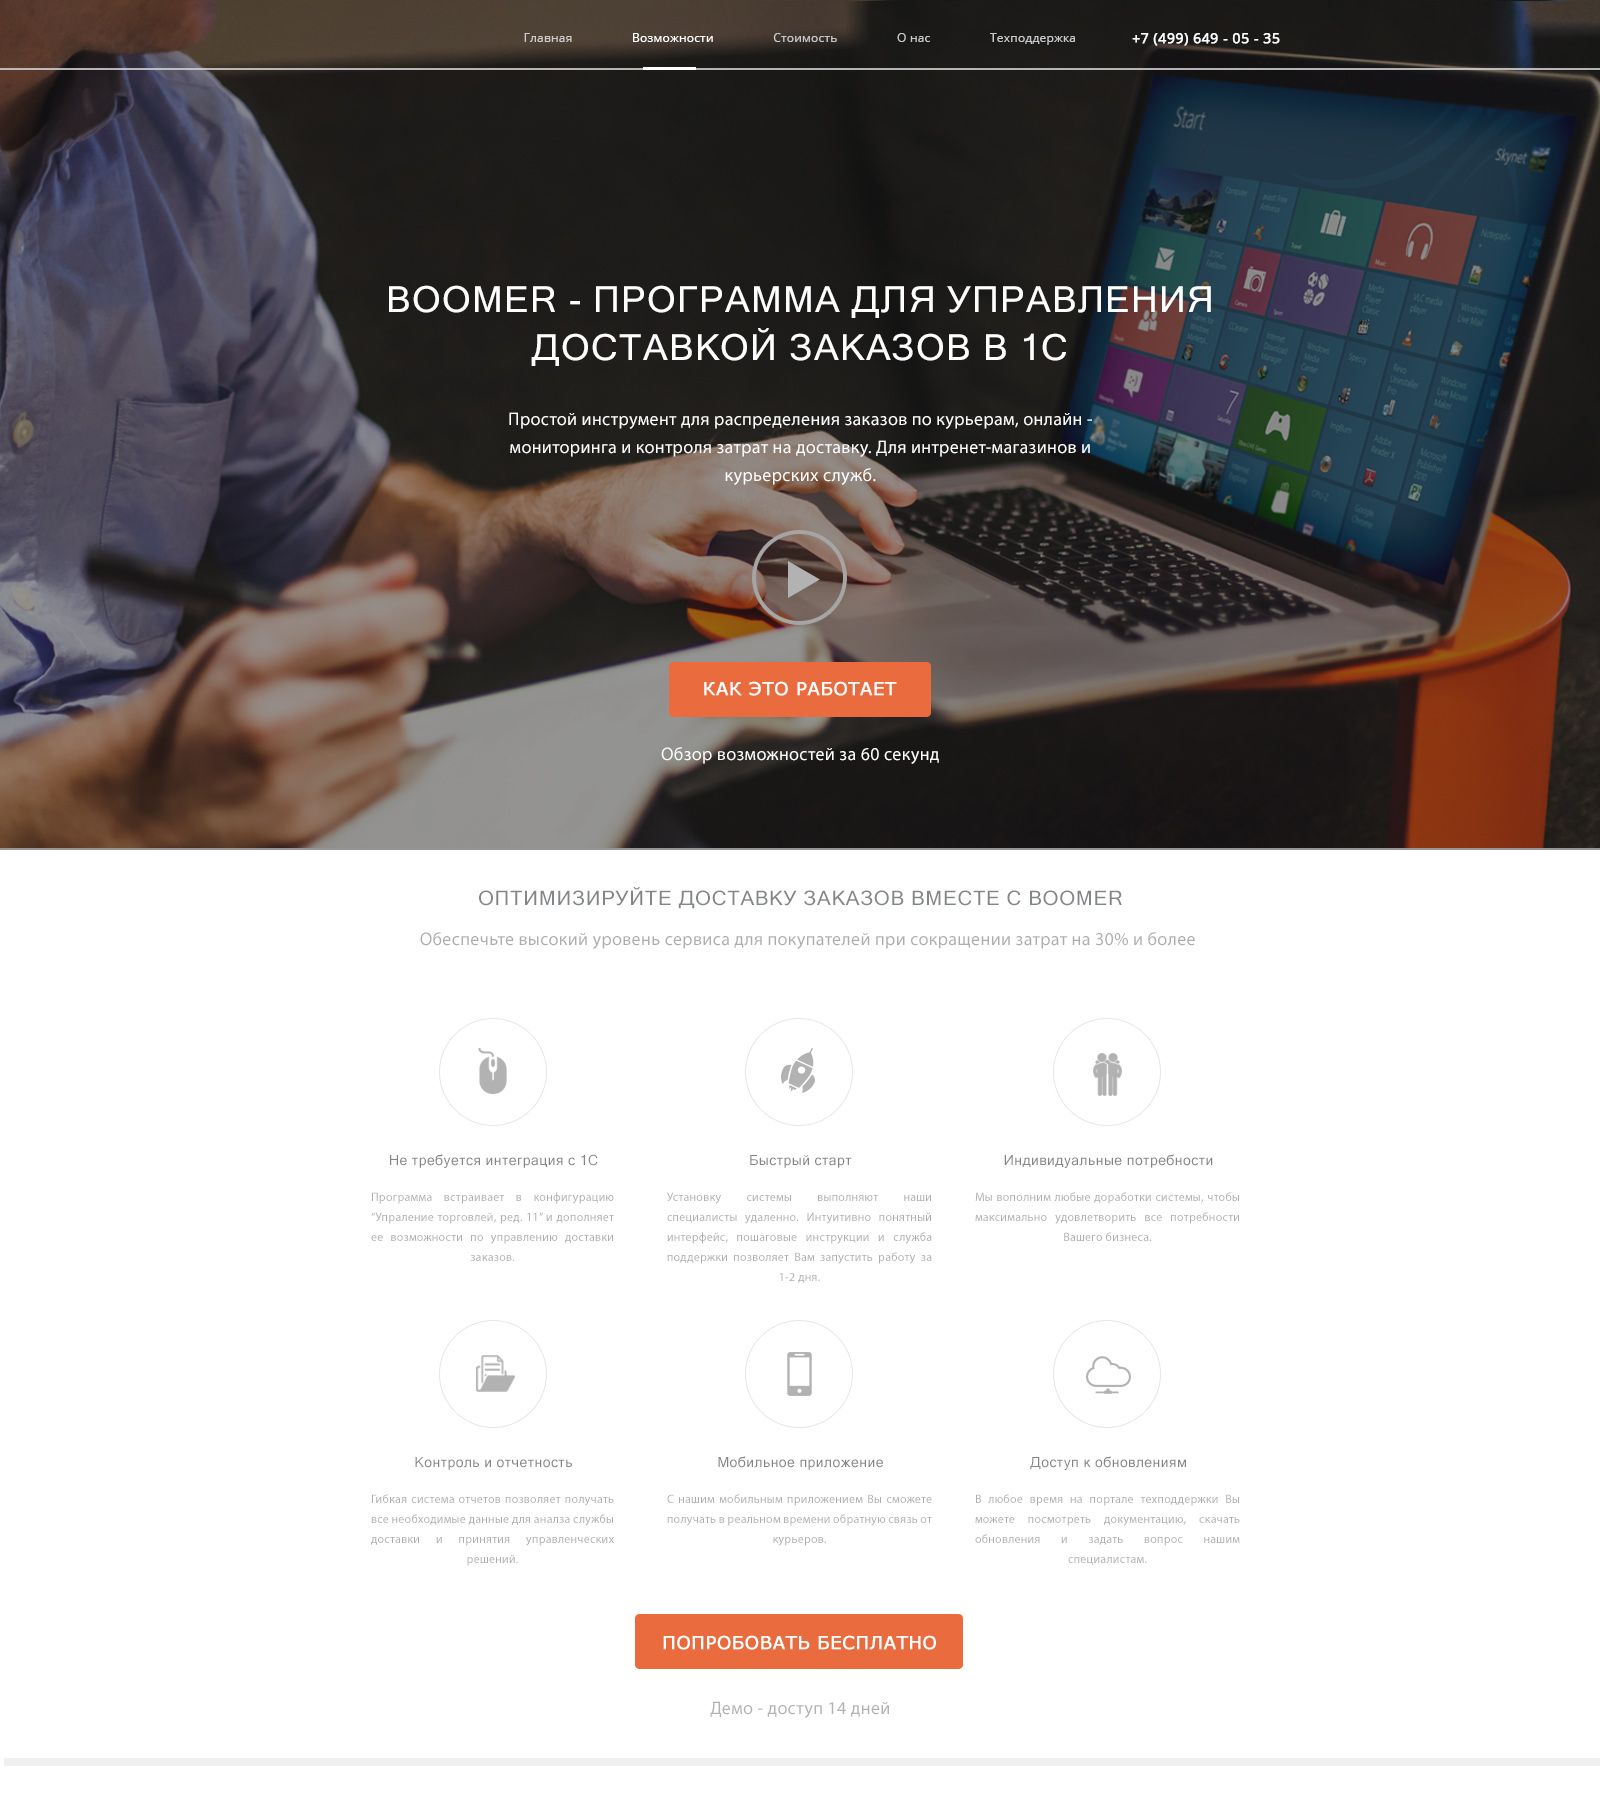 Landing page для Landig Page для стартапа по готовому прототипу - дизайнер PelmeshkOsS